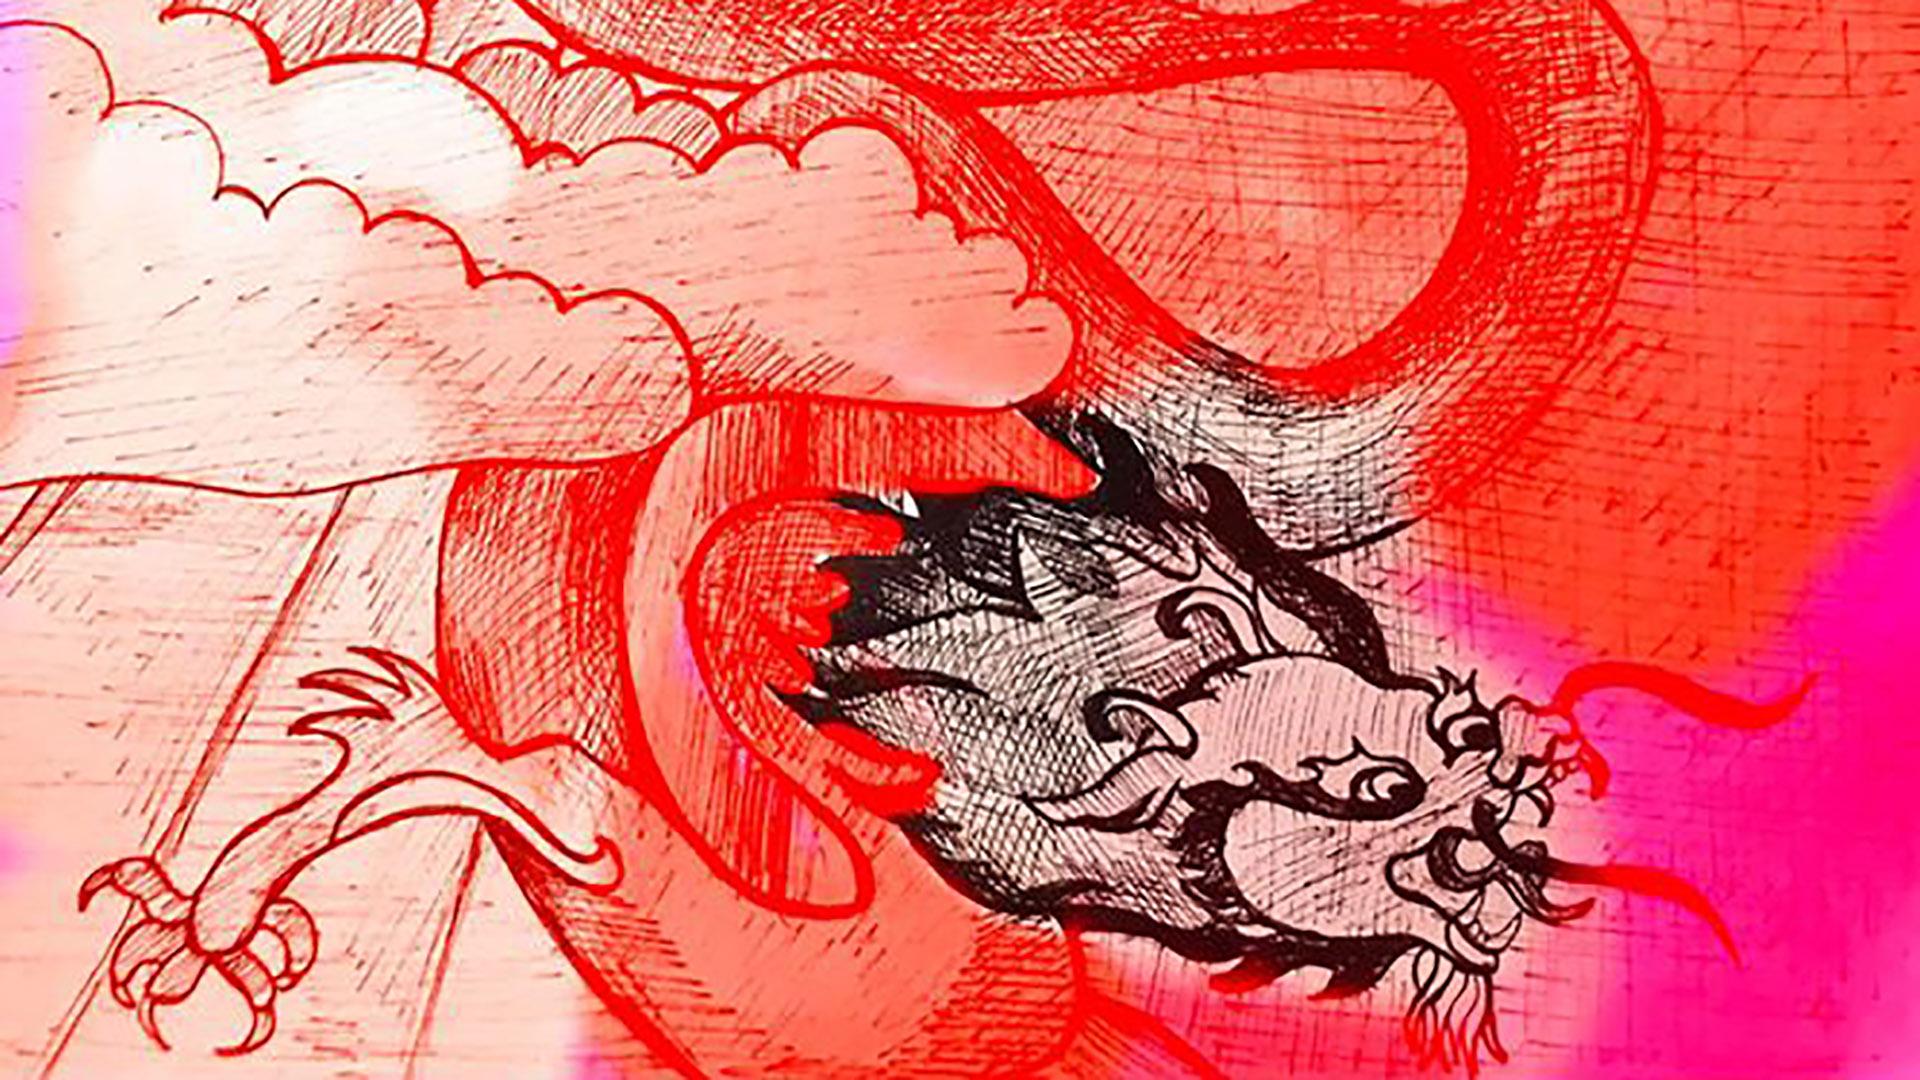 00329 Sagan om PanGu illustration Viktoria Siwek 1920×1080